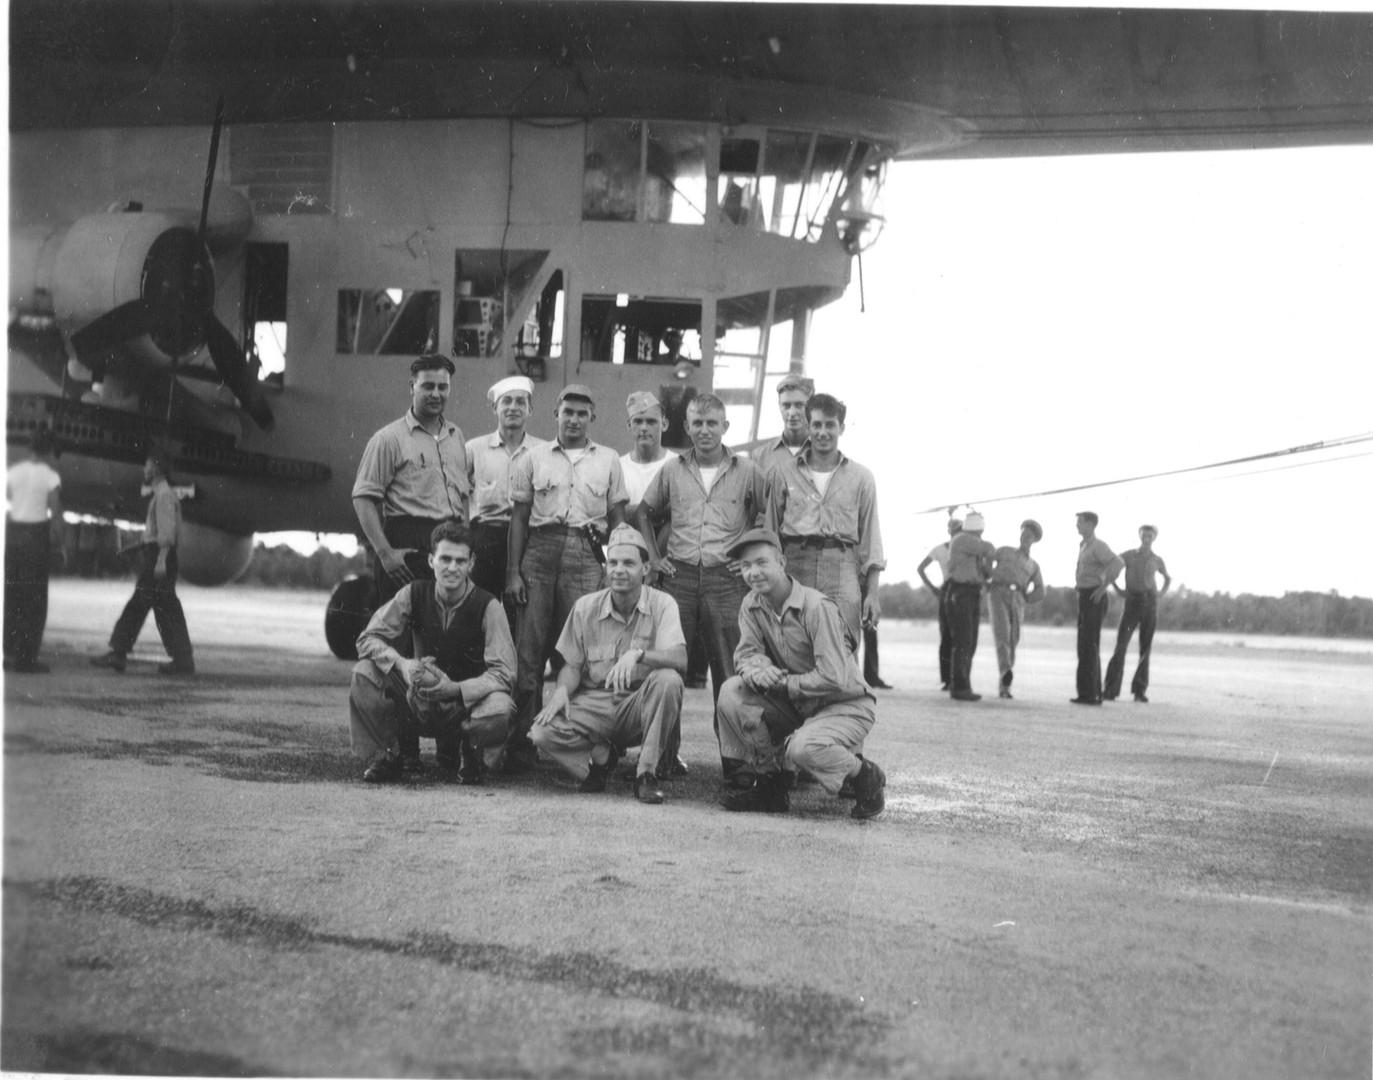 1942-nov-blimp-crew.jpg